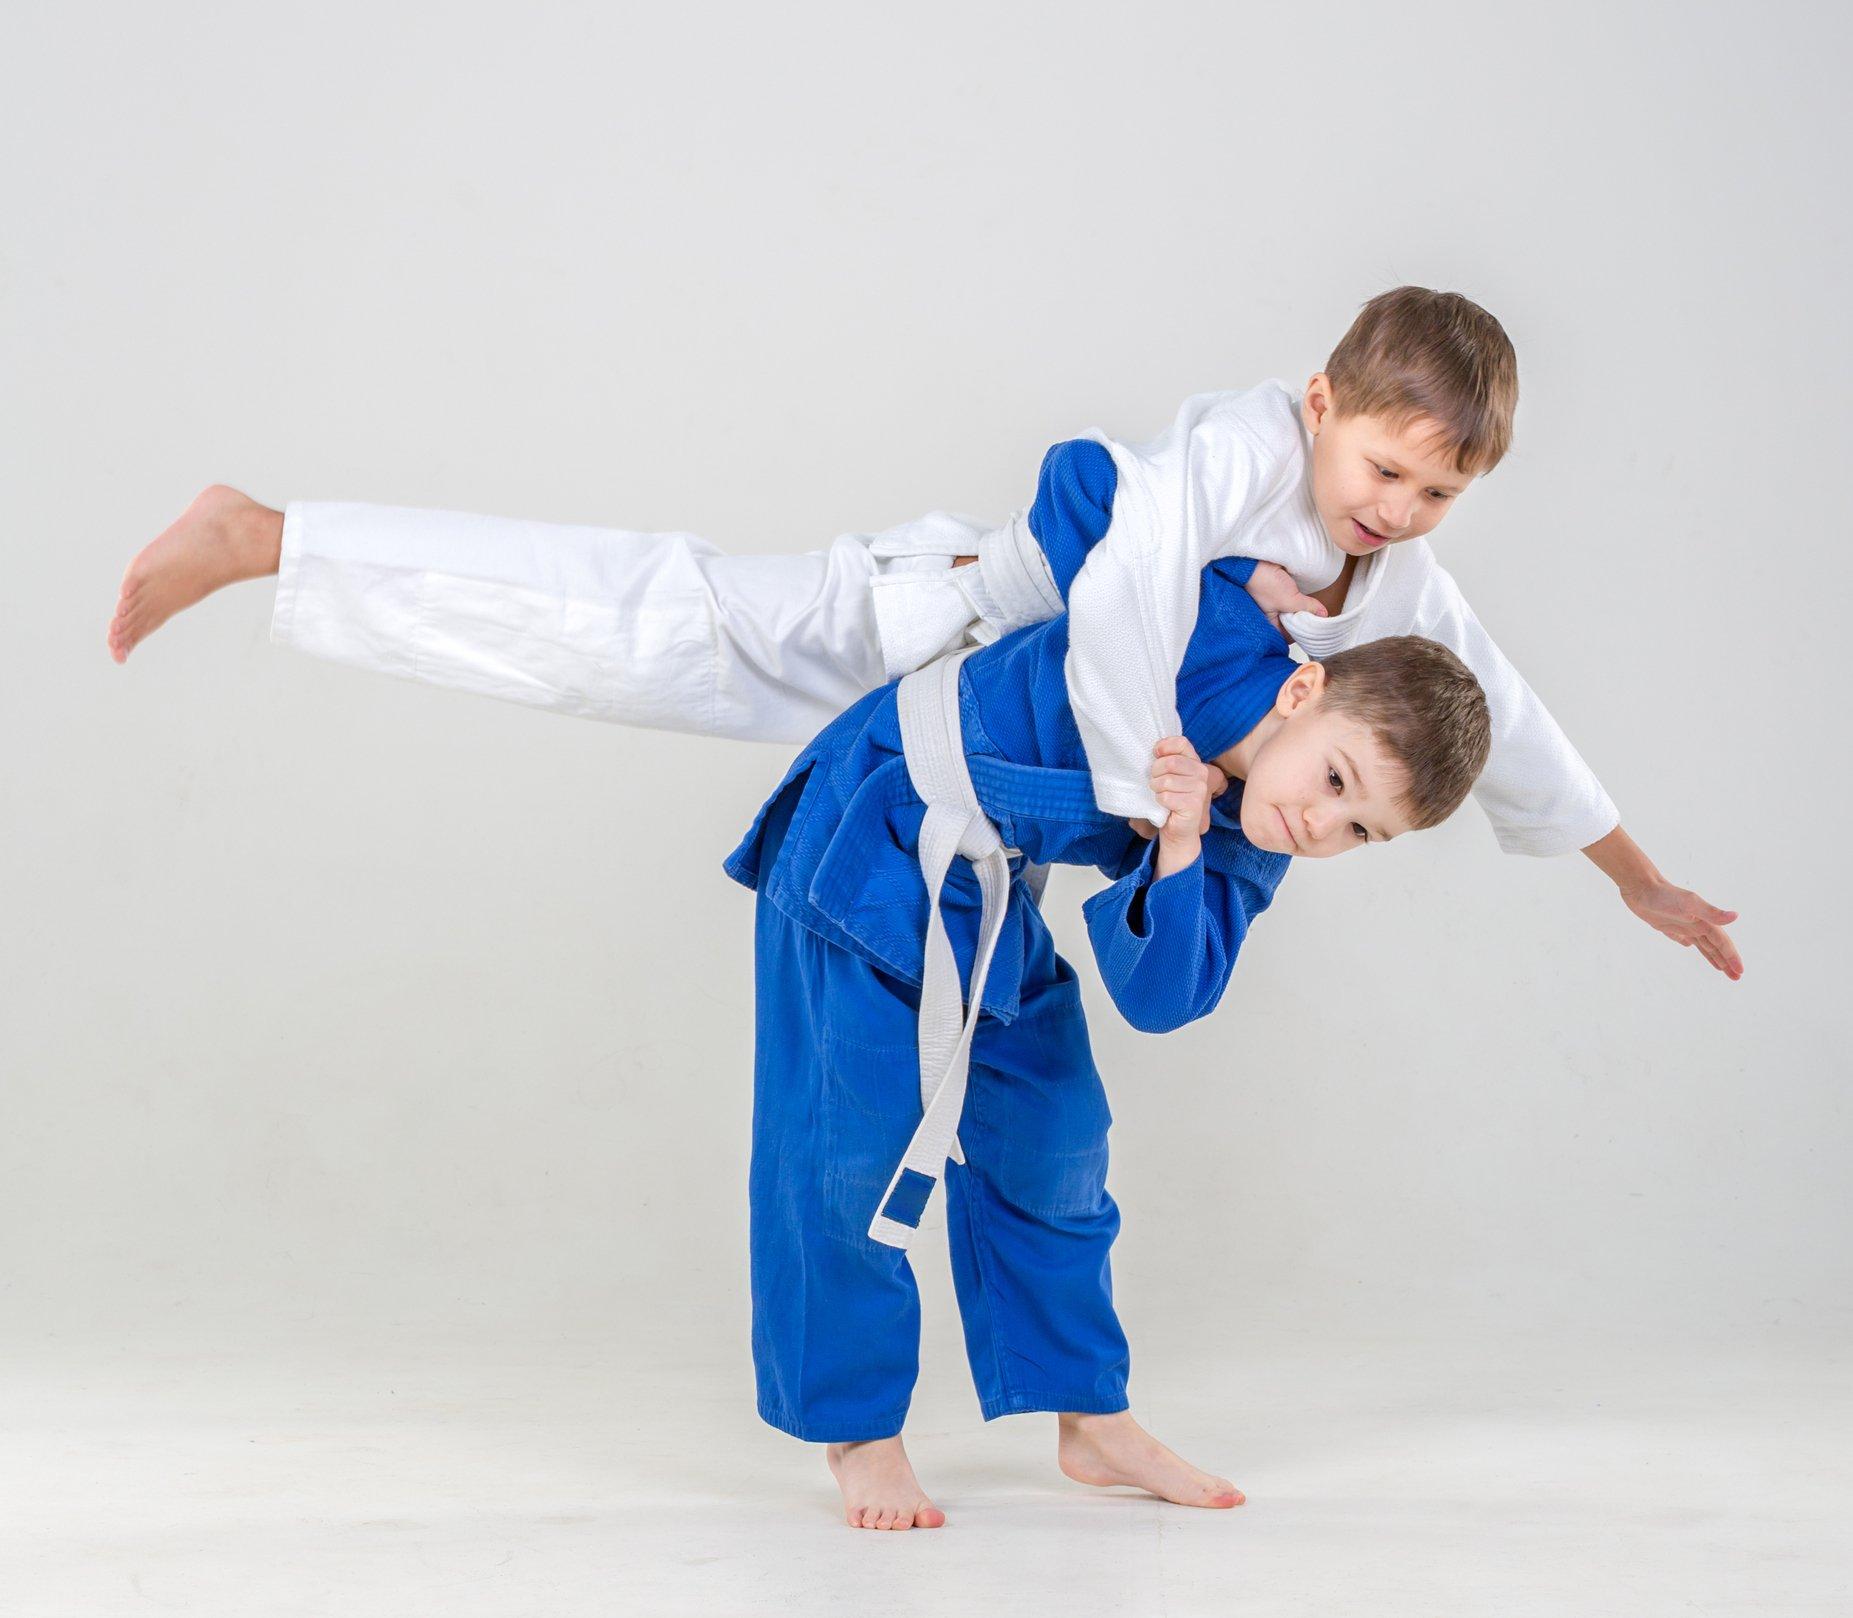 Kids Brazilian Jiu Jitsu Classes in Massapequa, NY